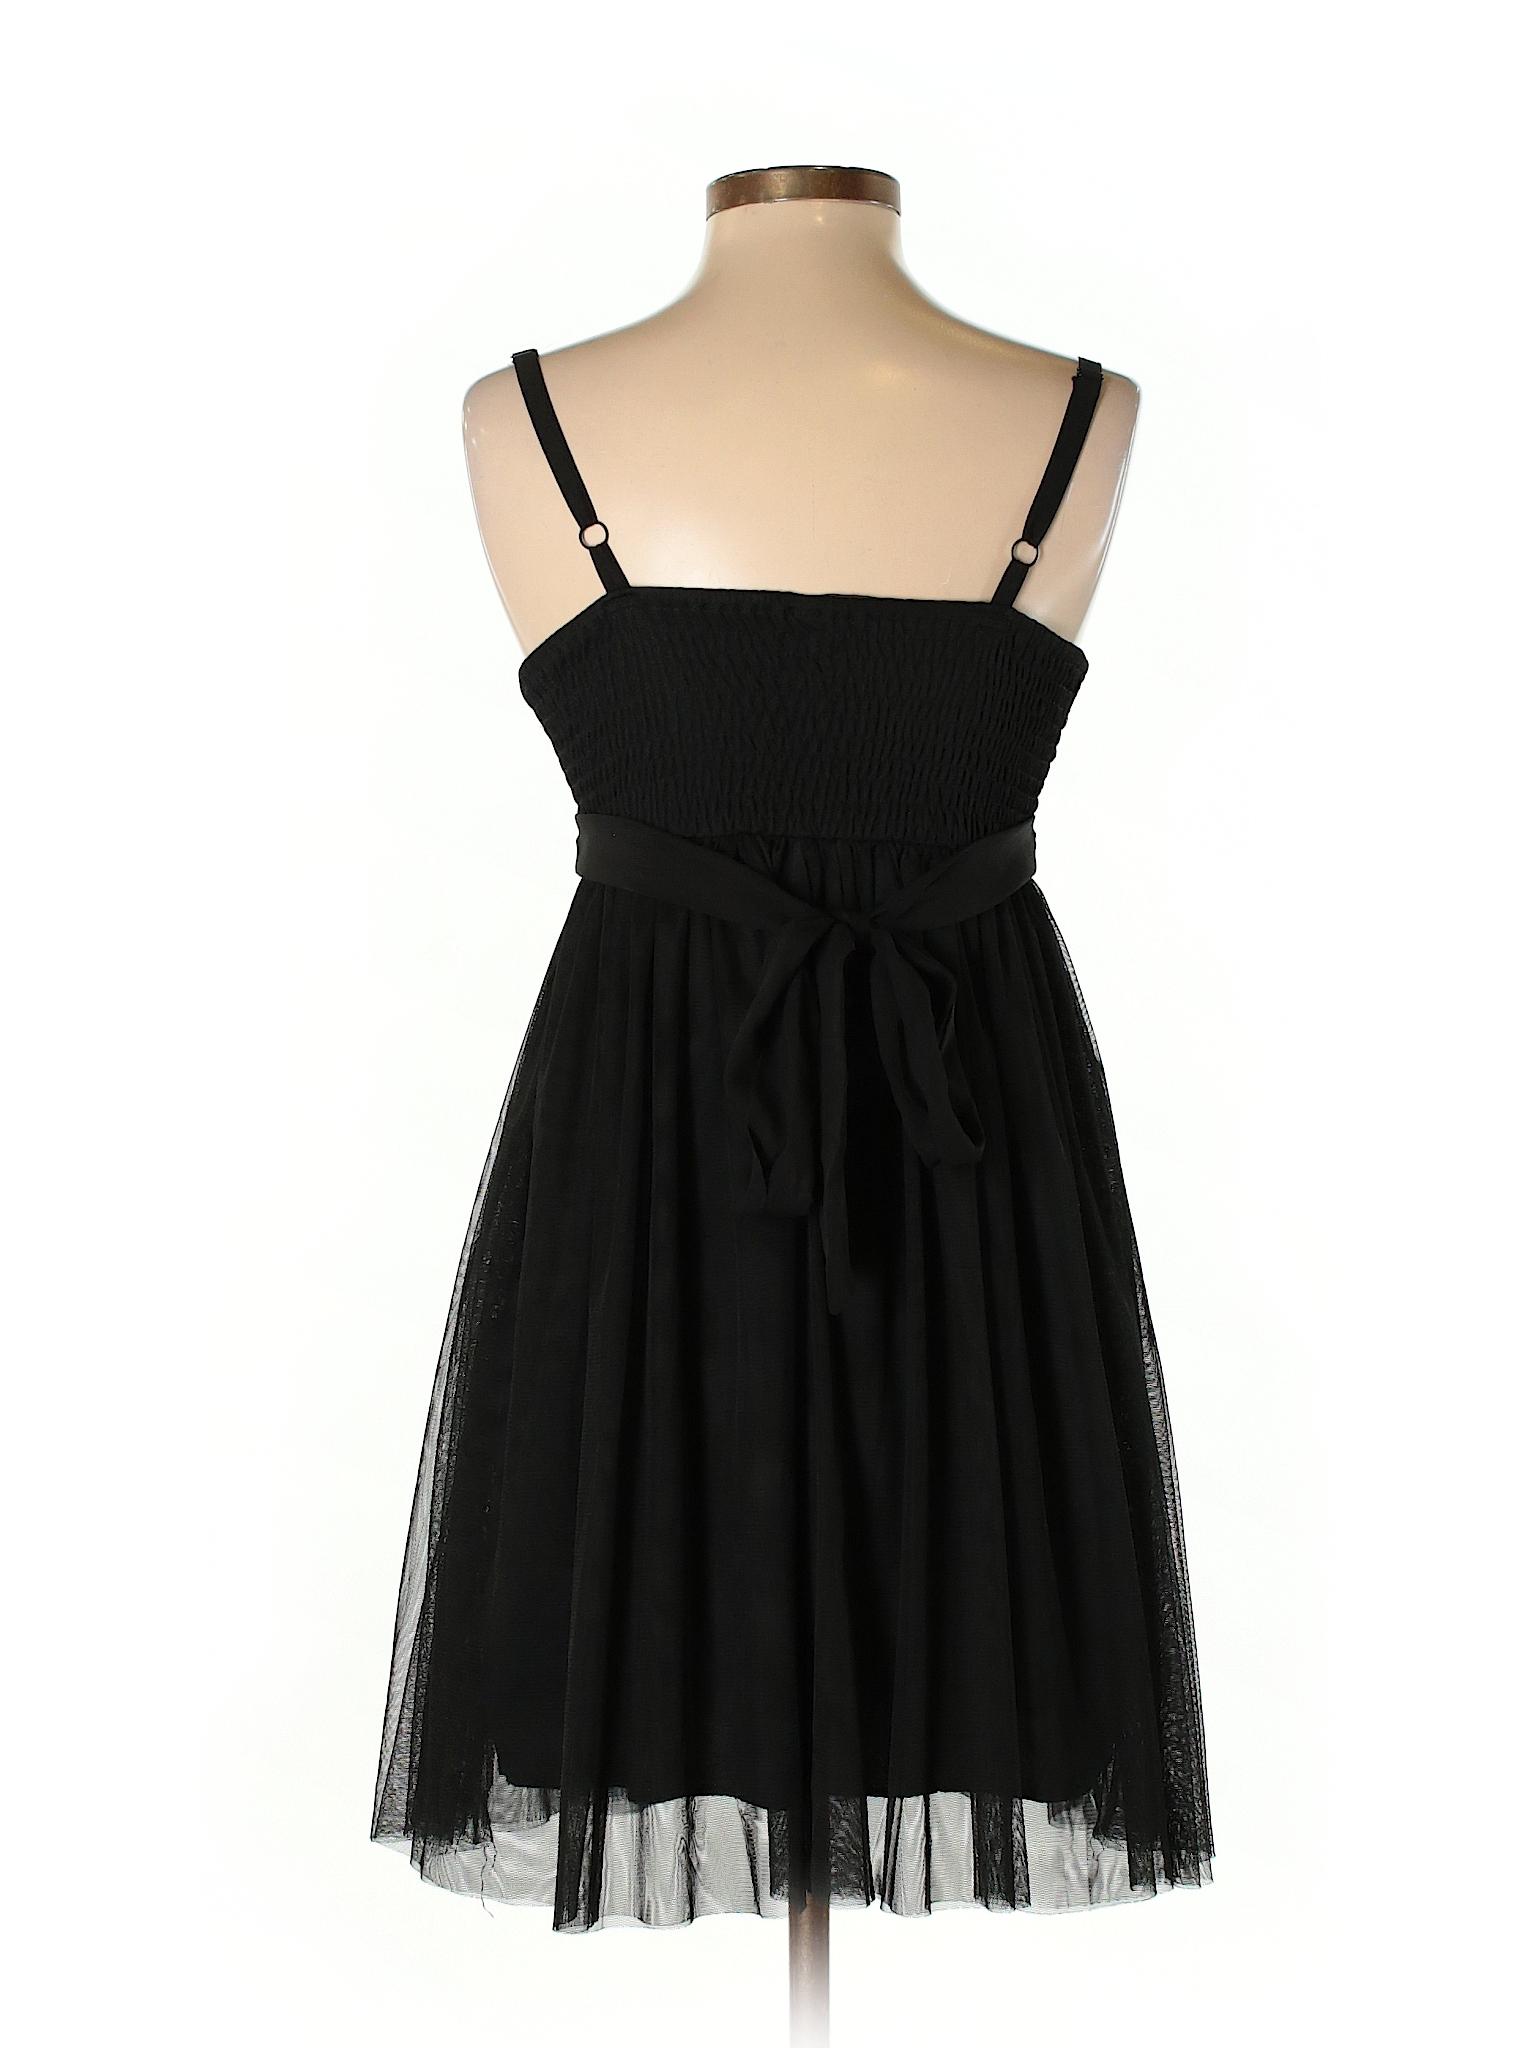 Xhilaration Dress Selling Dress Selling Casual Casual Xhilaration Xhilaration Casual Selling Dress Selling Selling Dress Casual Xhilaration 44pAP